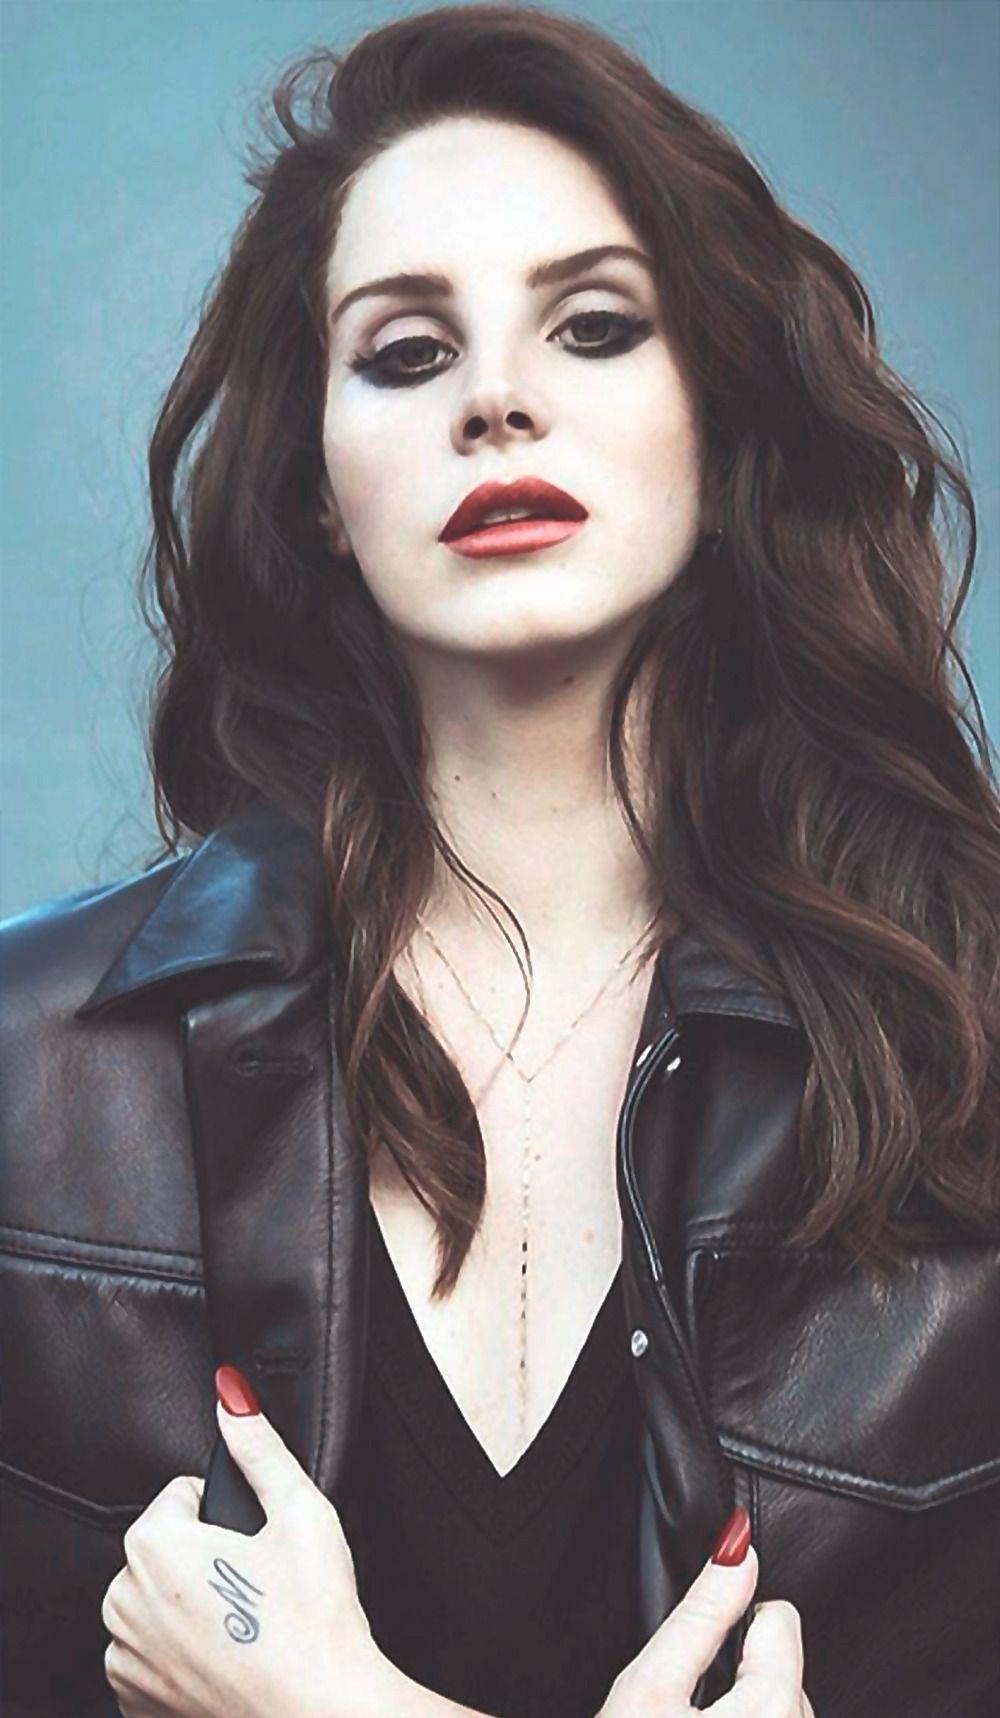 Lana Del Rey Wallpapers Top Free Lana Del Rey Backgrounds Wallpaperaccess